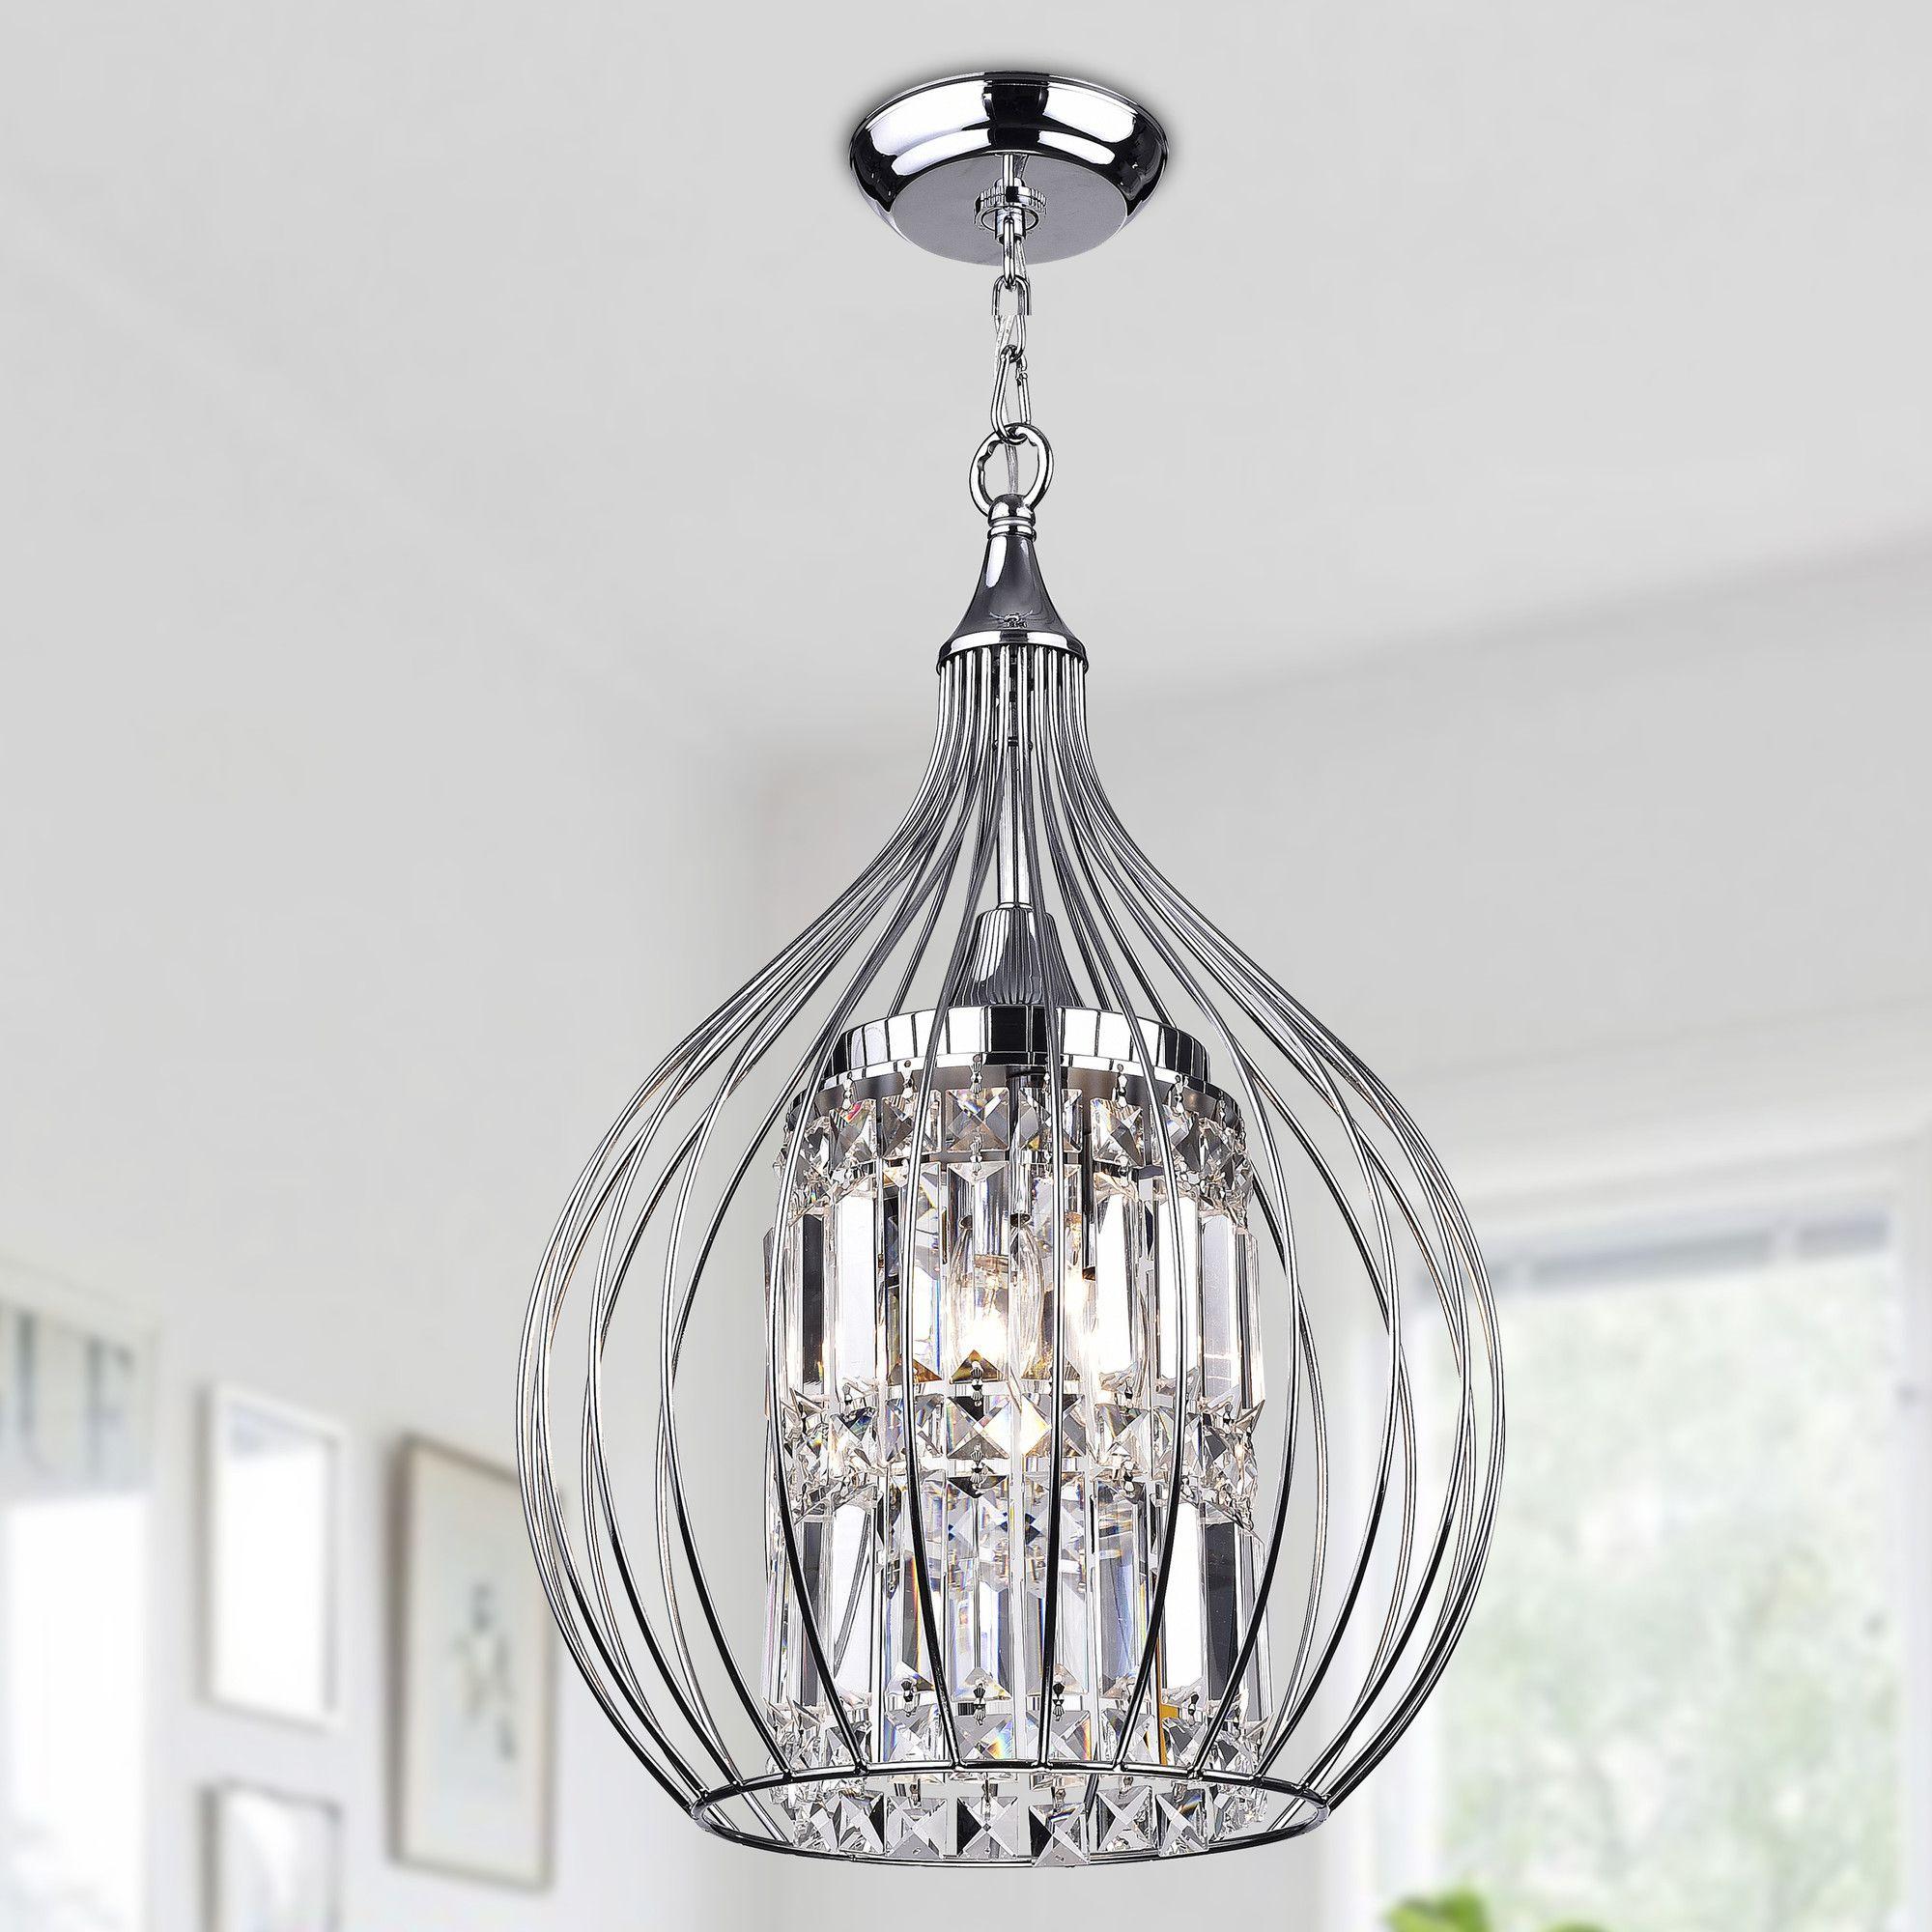 Lolaus light globe chandelier products pinterest chandelier